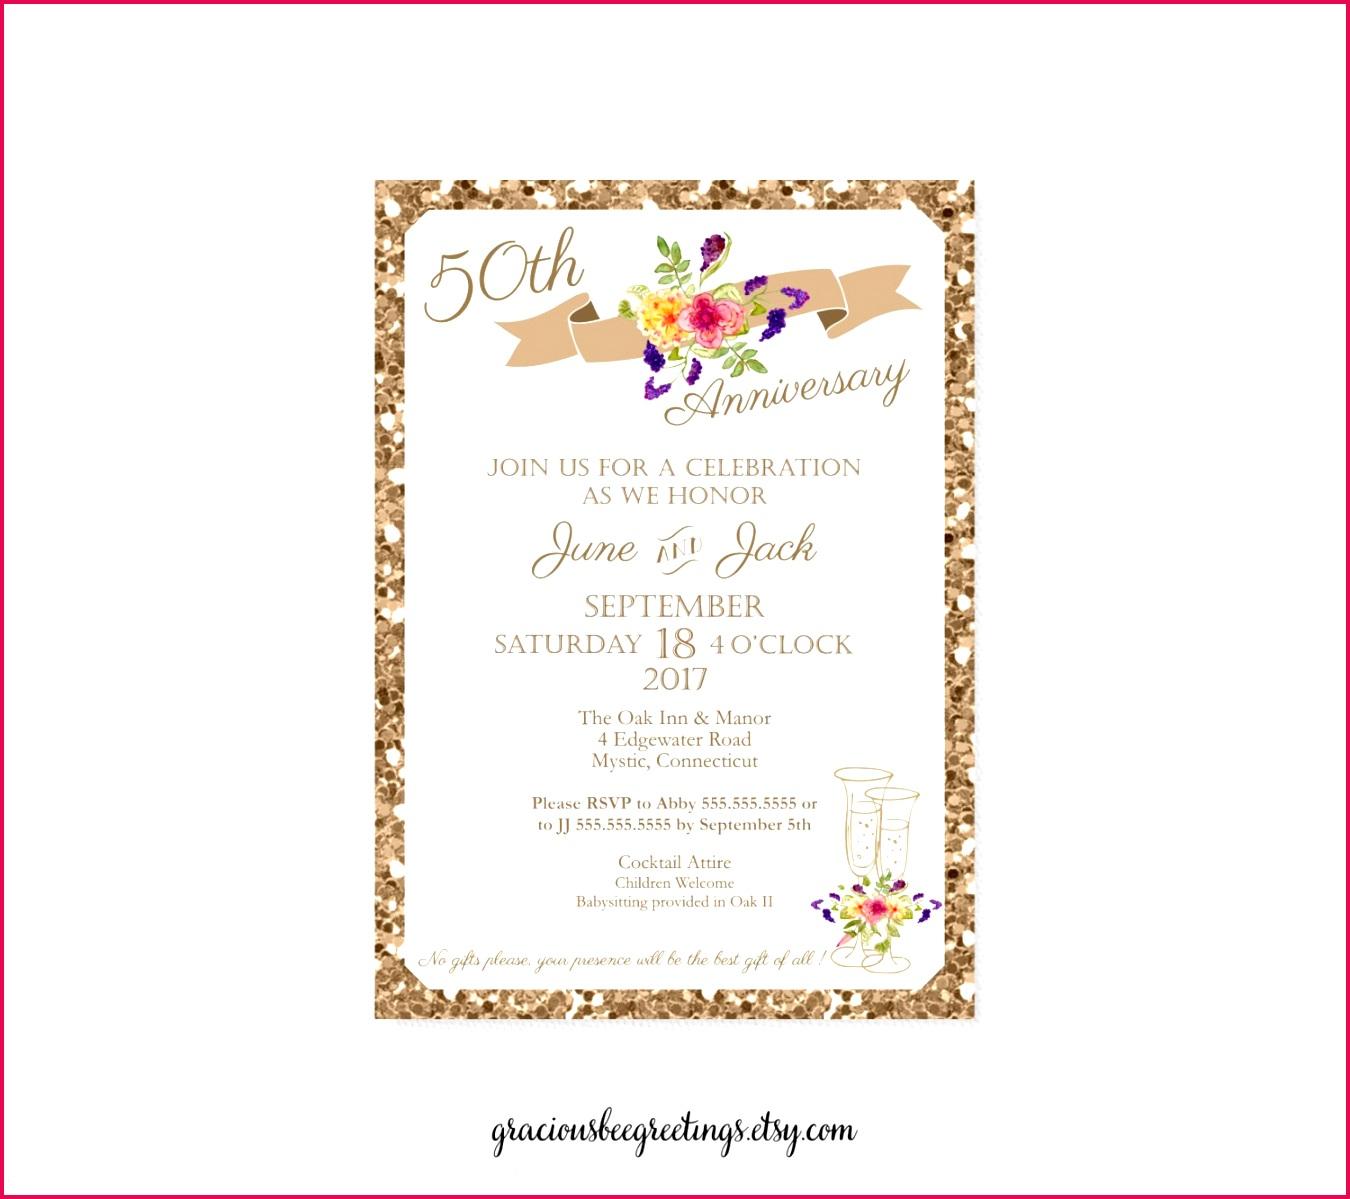 vow renewal invitation wording fresh elegant wedding vows template of vow renewal invitation wording